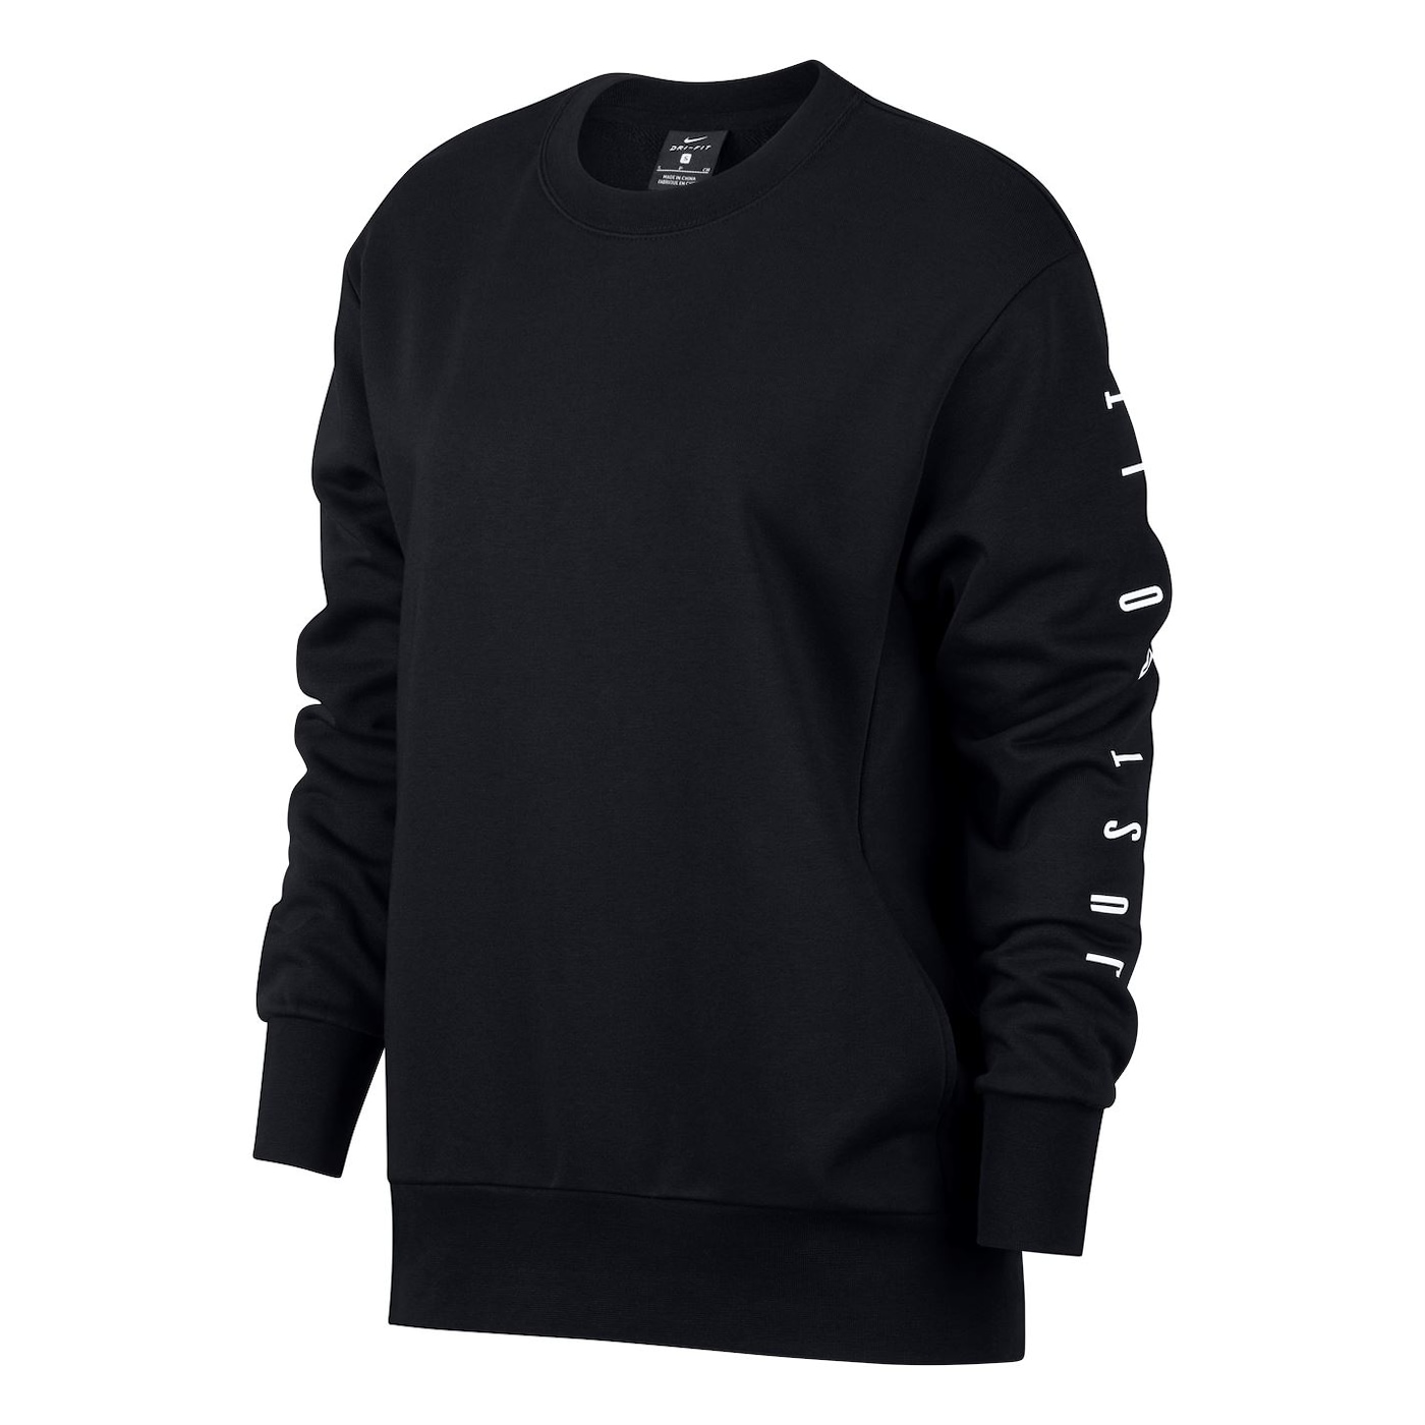 Nike Graphic Crew Sweatshirt Ladies